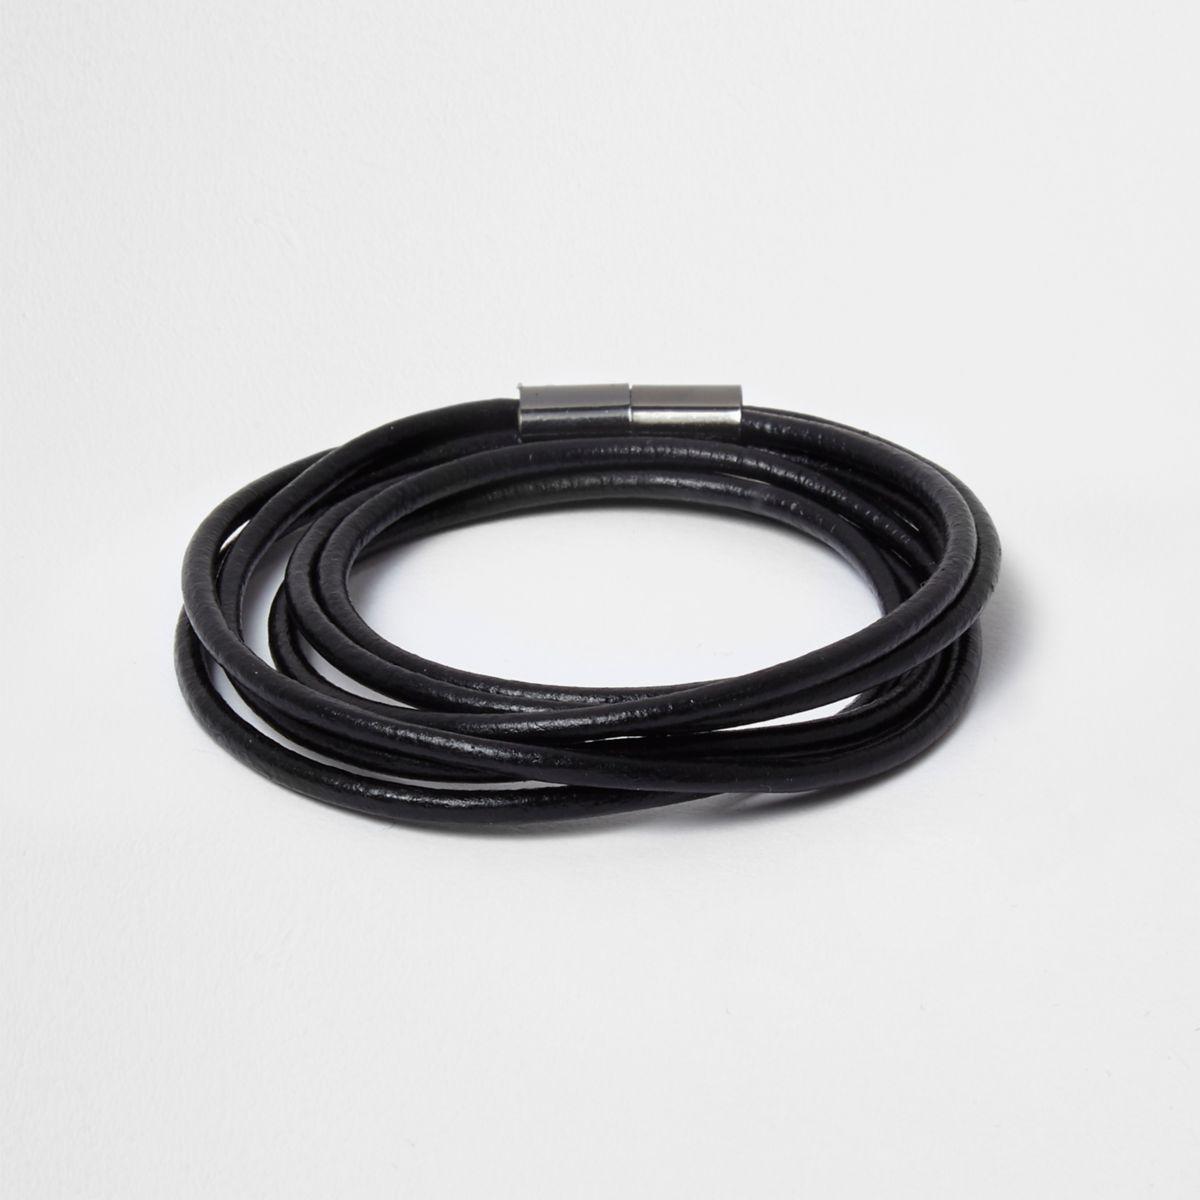 Zwarte magnetische wikkelarmband